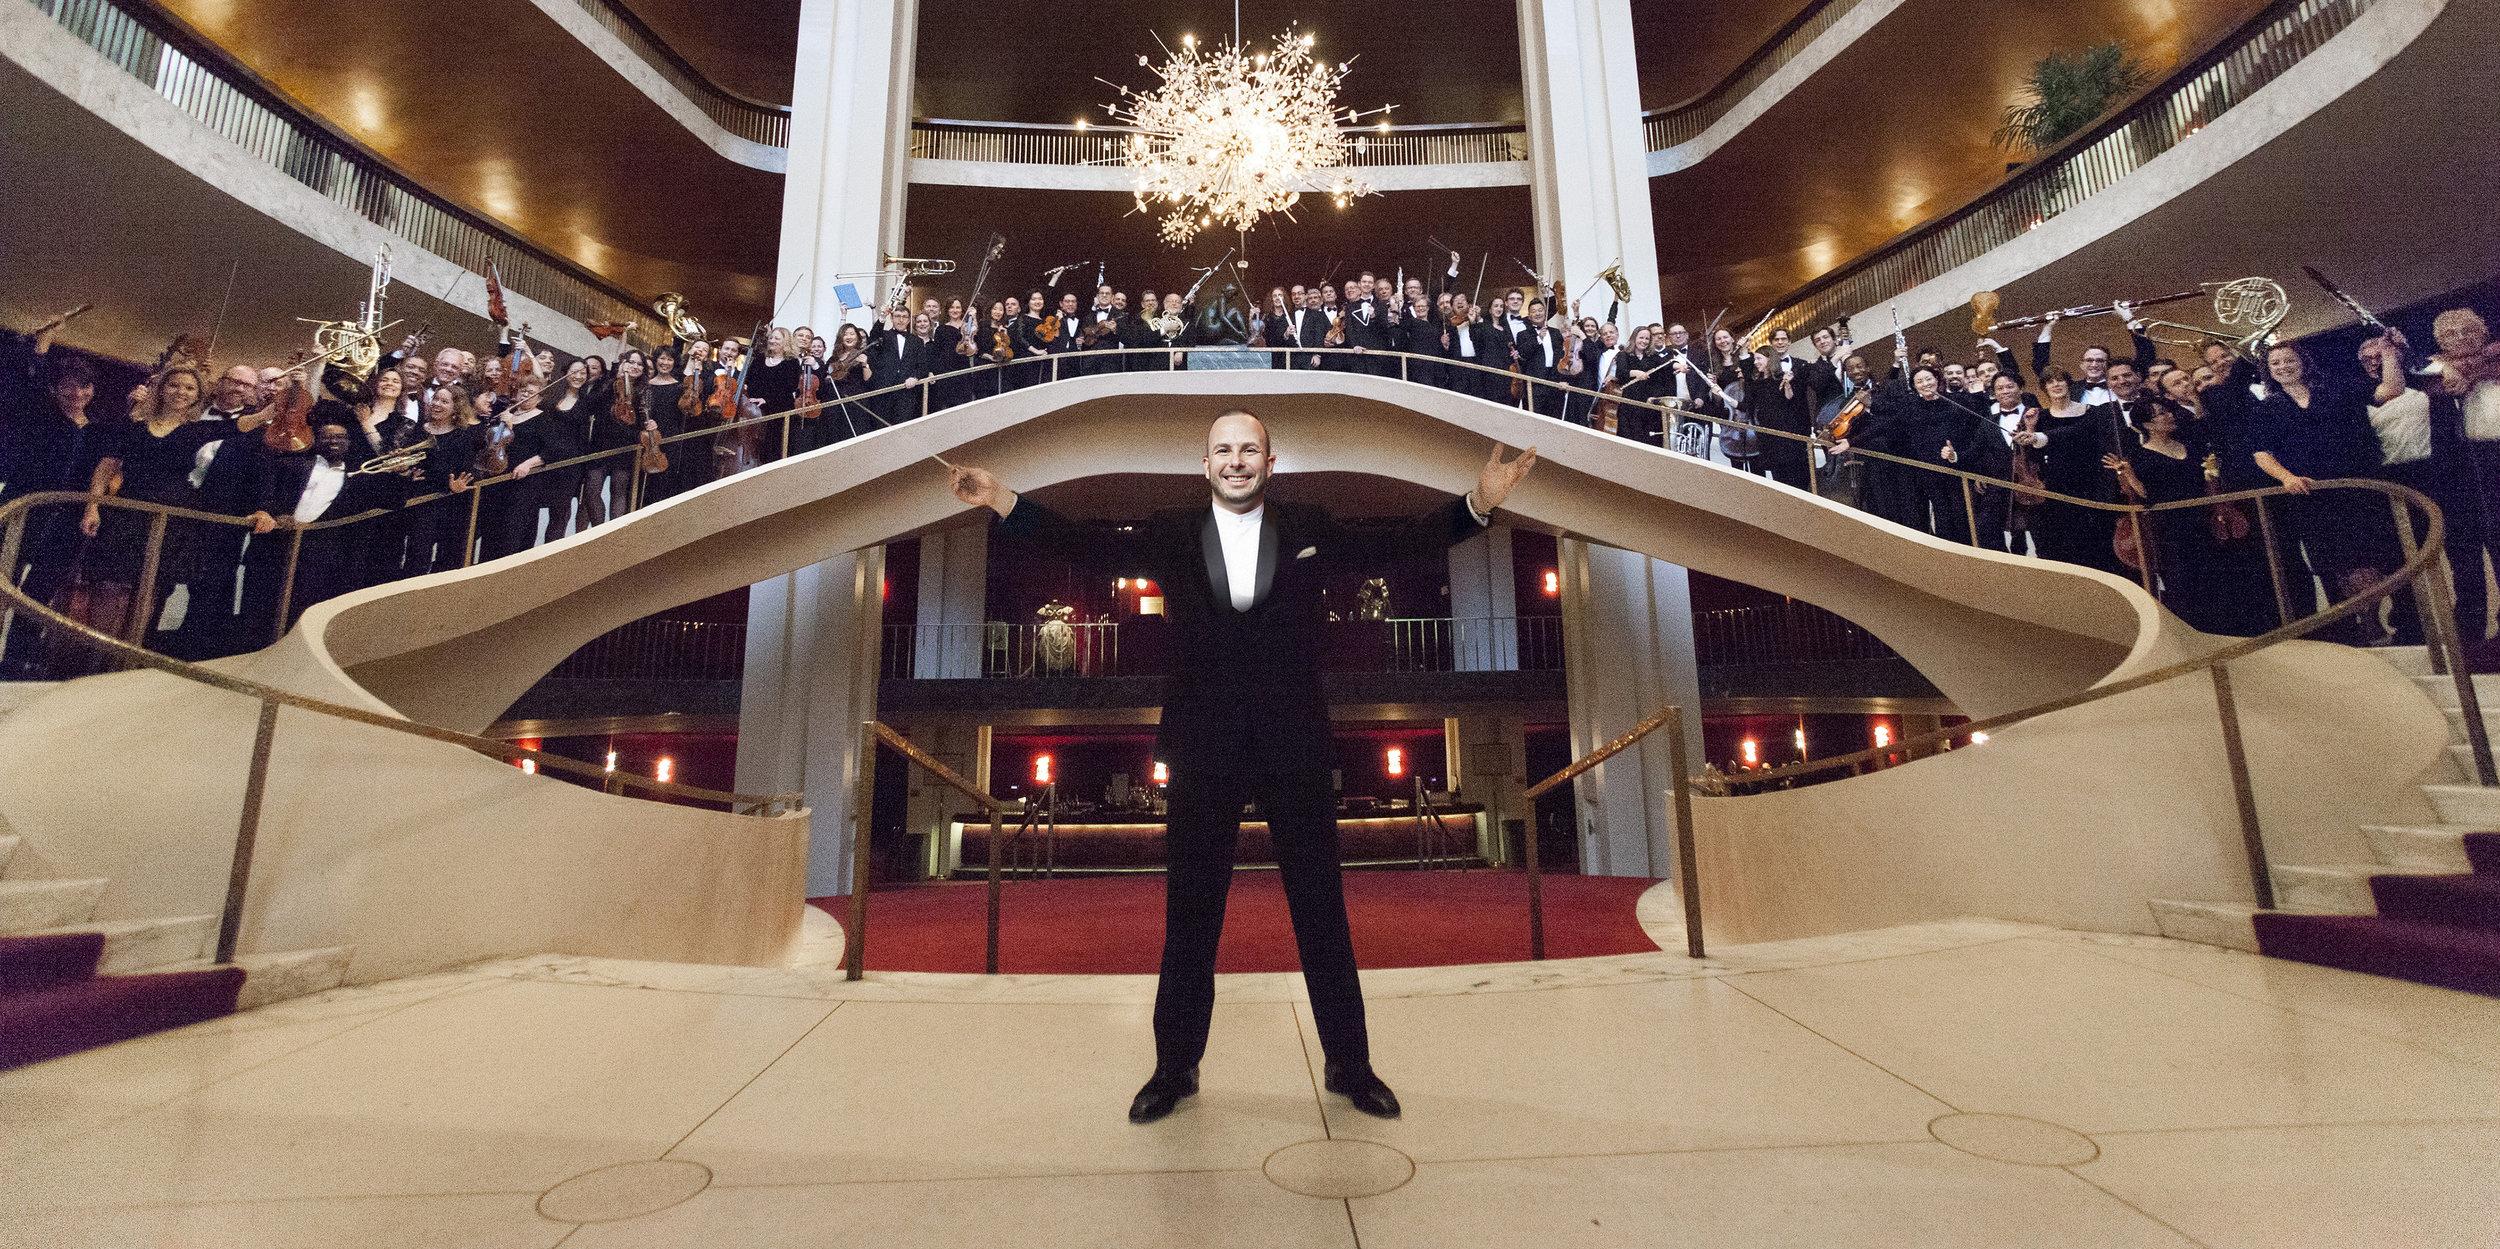 Full Orchestra Roster (Photo Credit: Rose Callahan /Metropolitan Opera